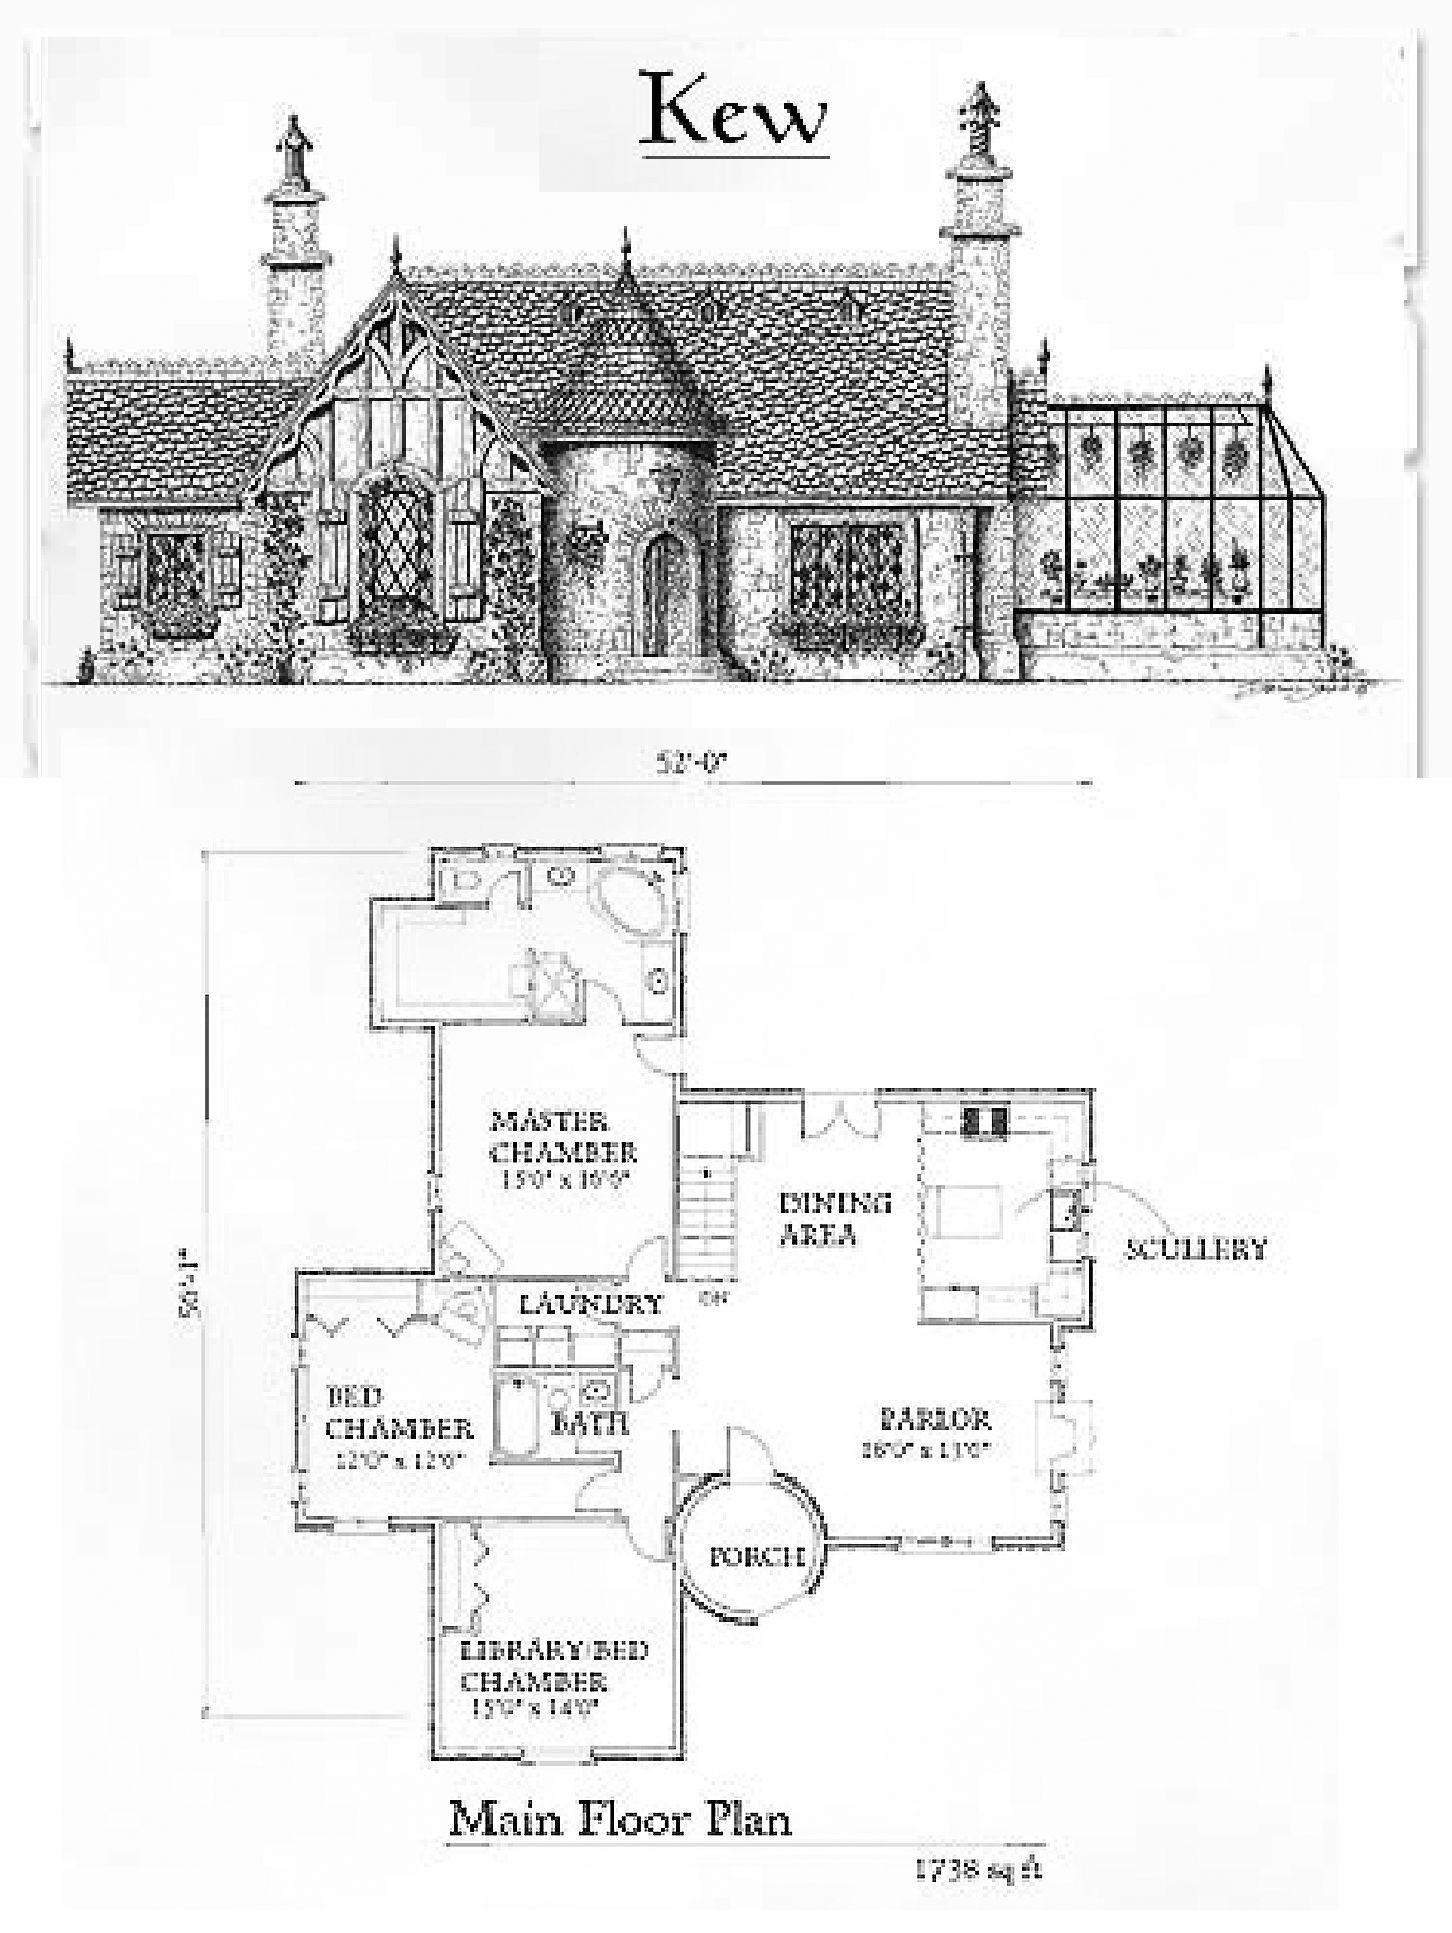 Kew 2 3 Br 1 Ba 1 Story Cute House Storybook House Plan